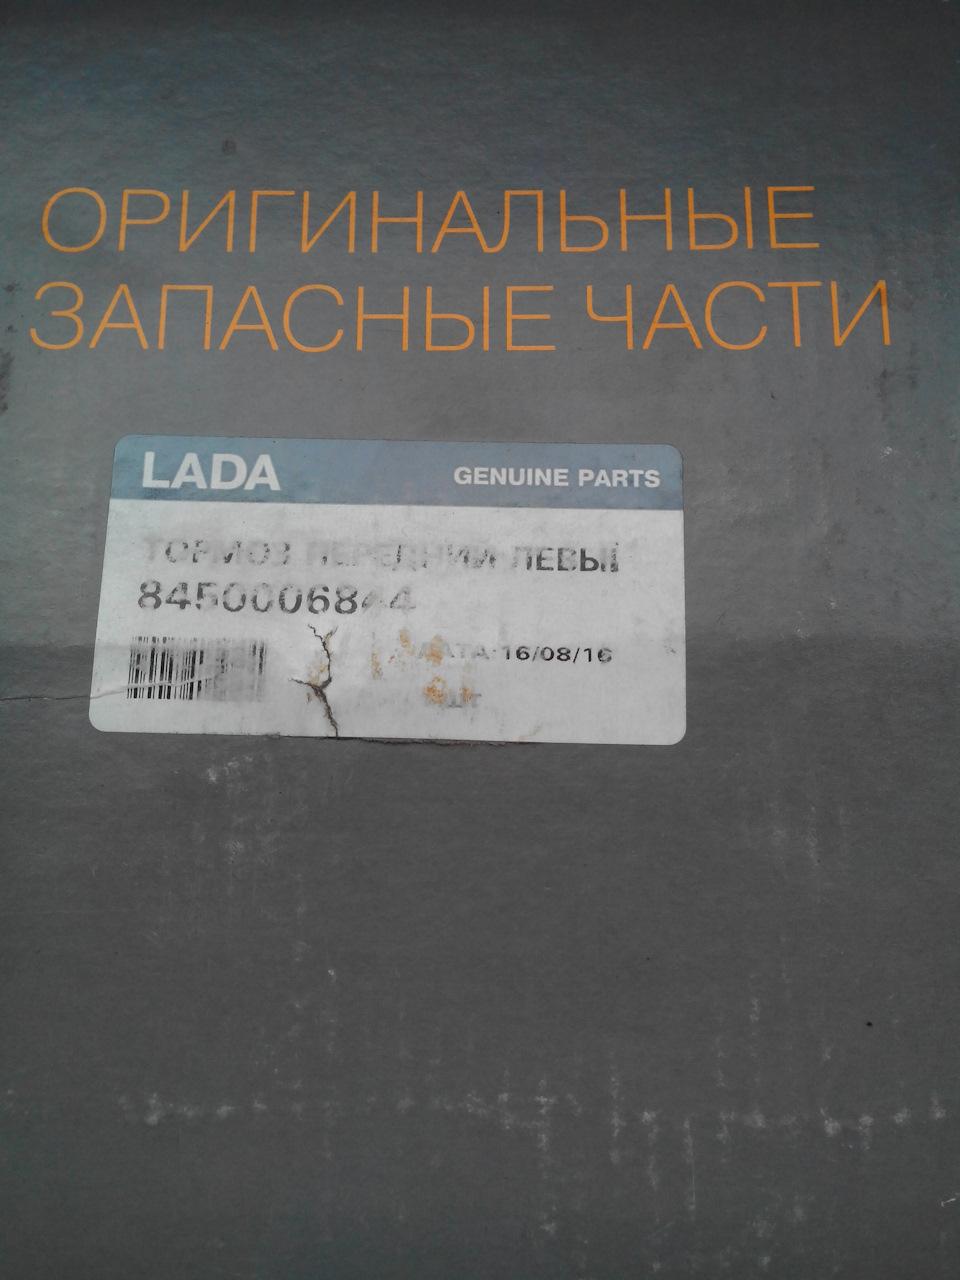 7b942ees-960